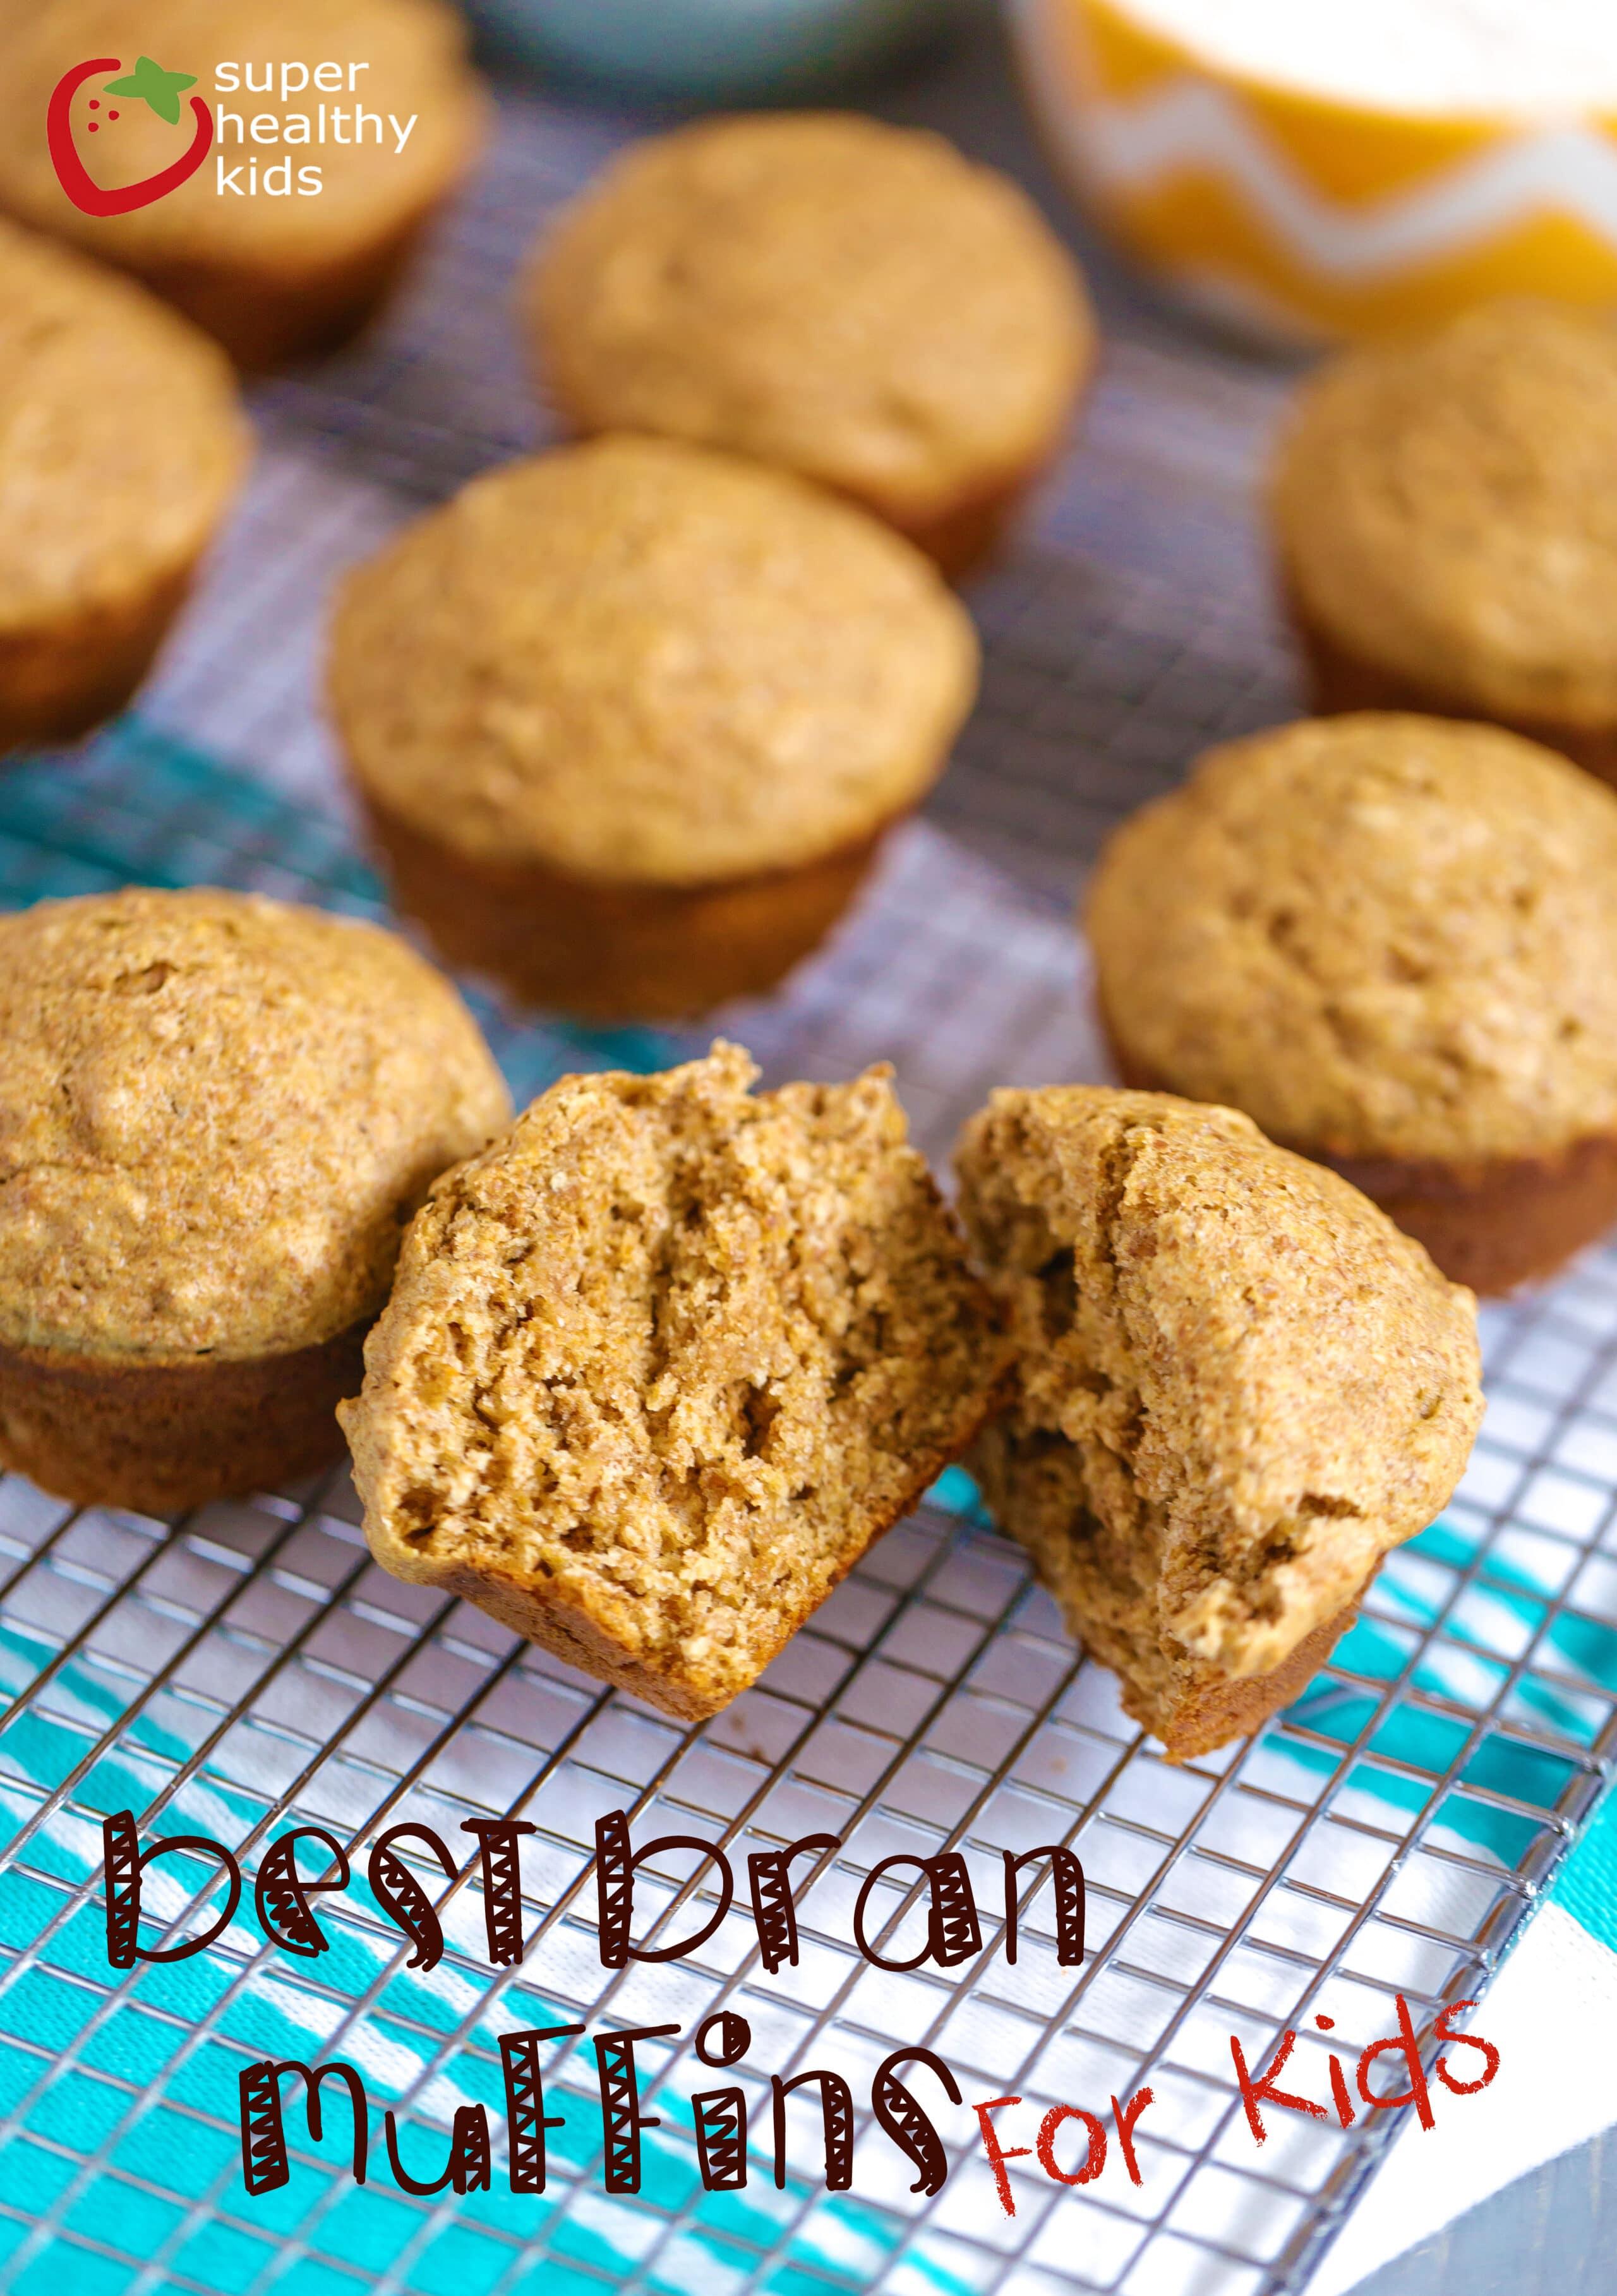 Best Bran Muffin Recipe for Kids - Super Healthy Kids